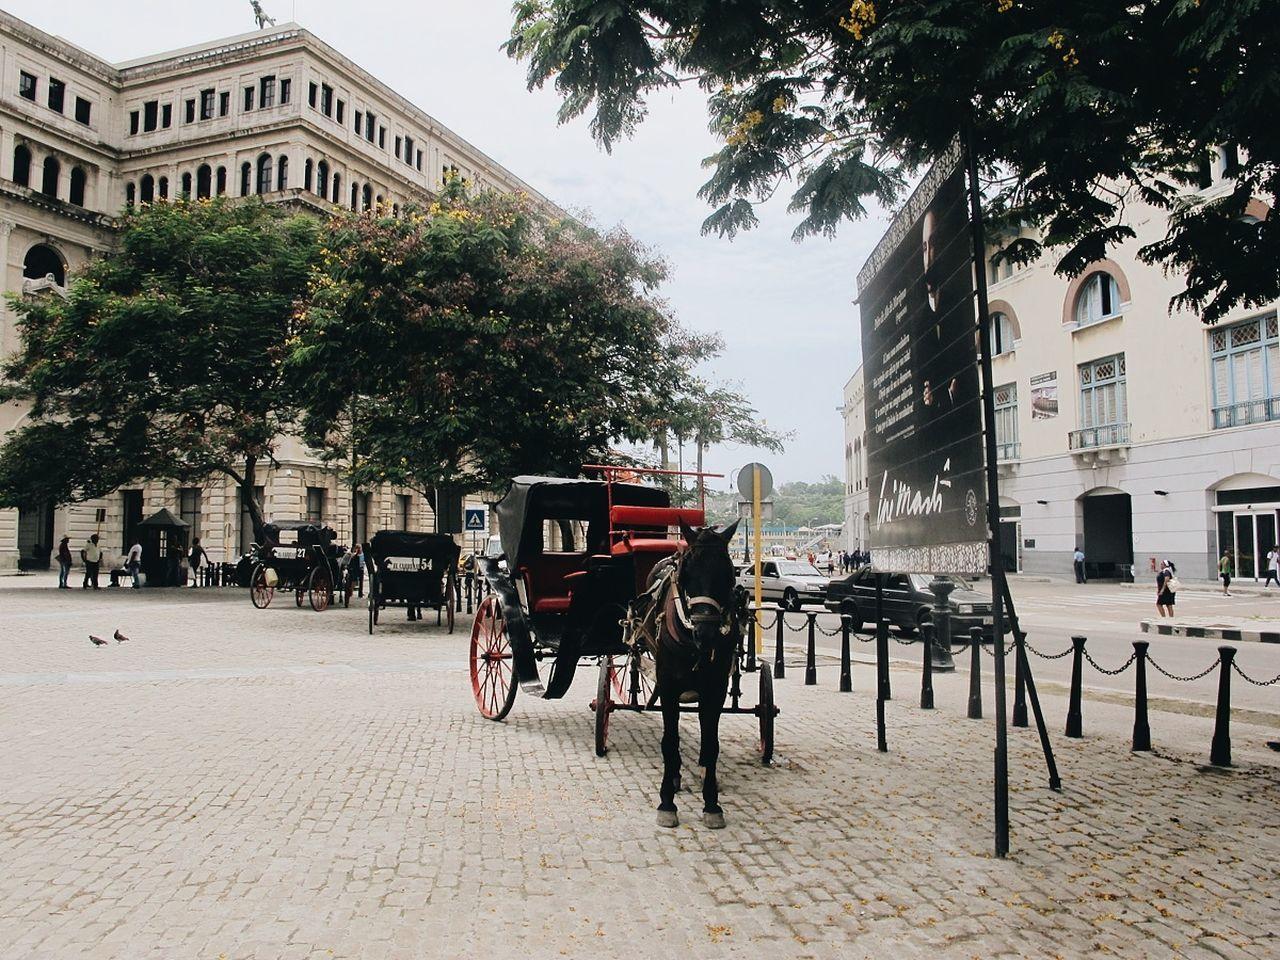 Horsedrawn On Street In City